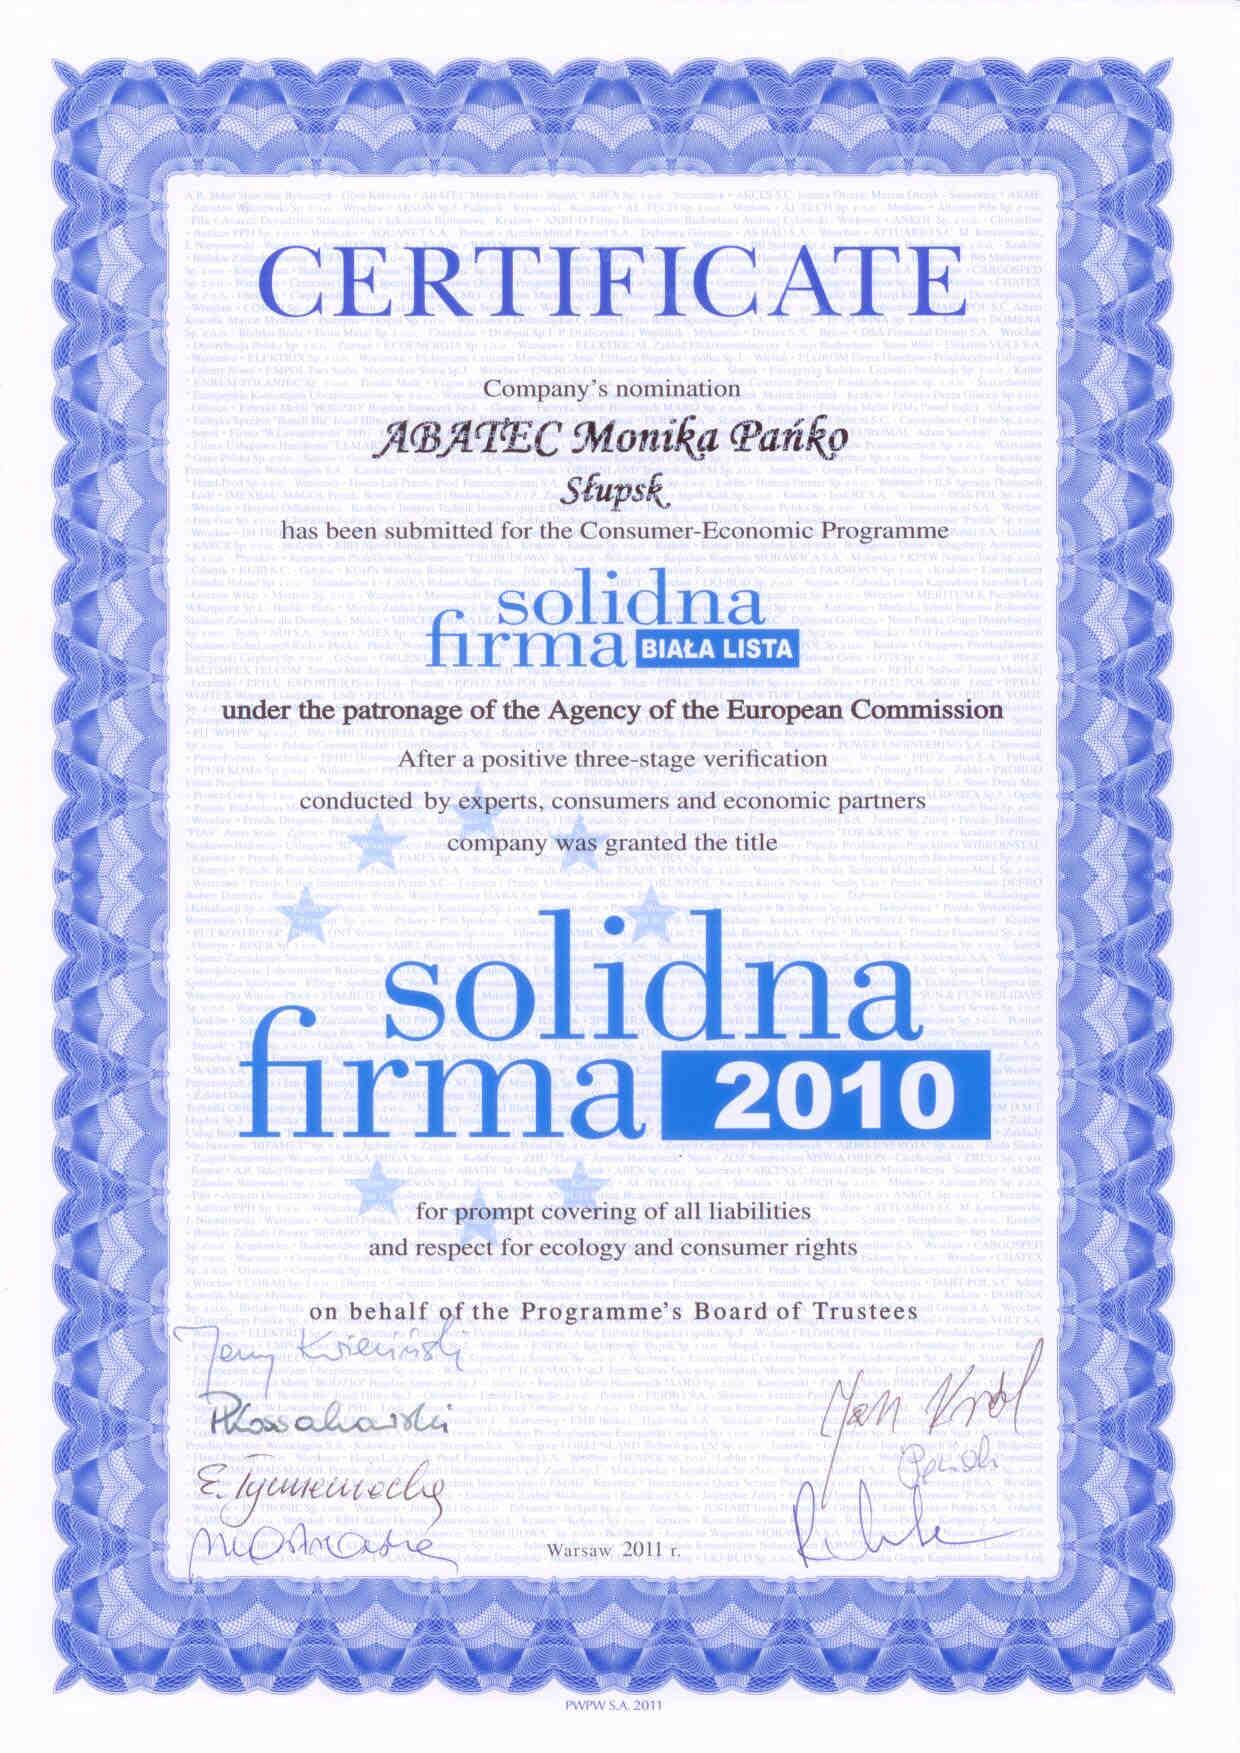 abatec certyfikat solidna firma 2010